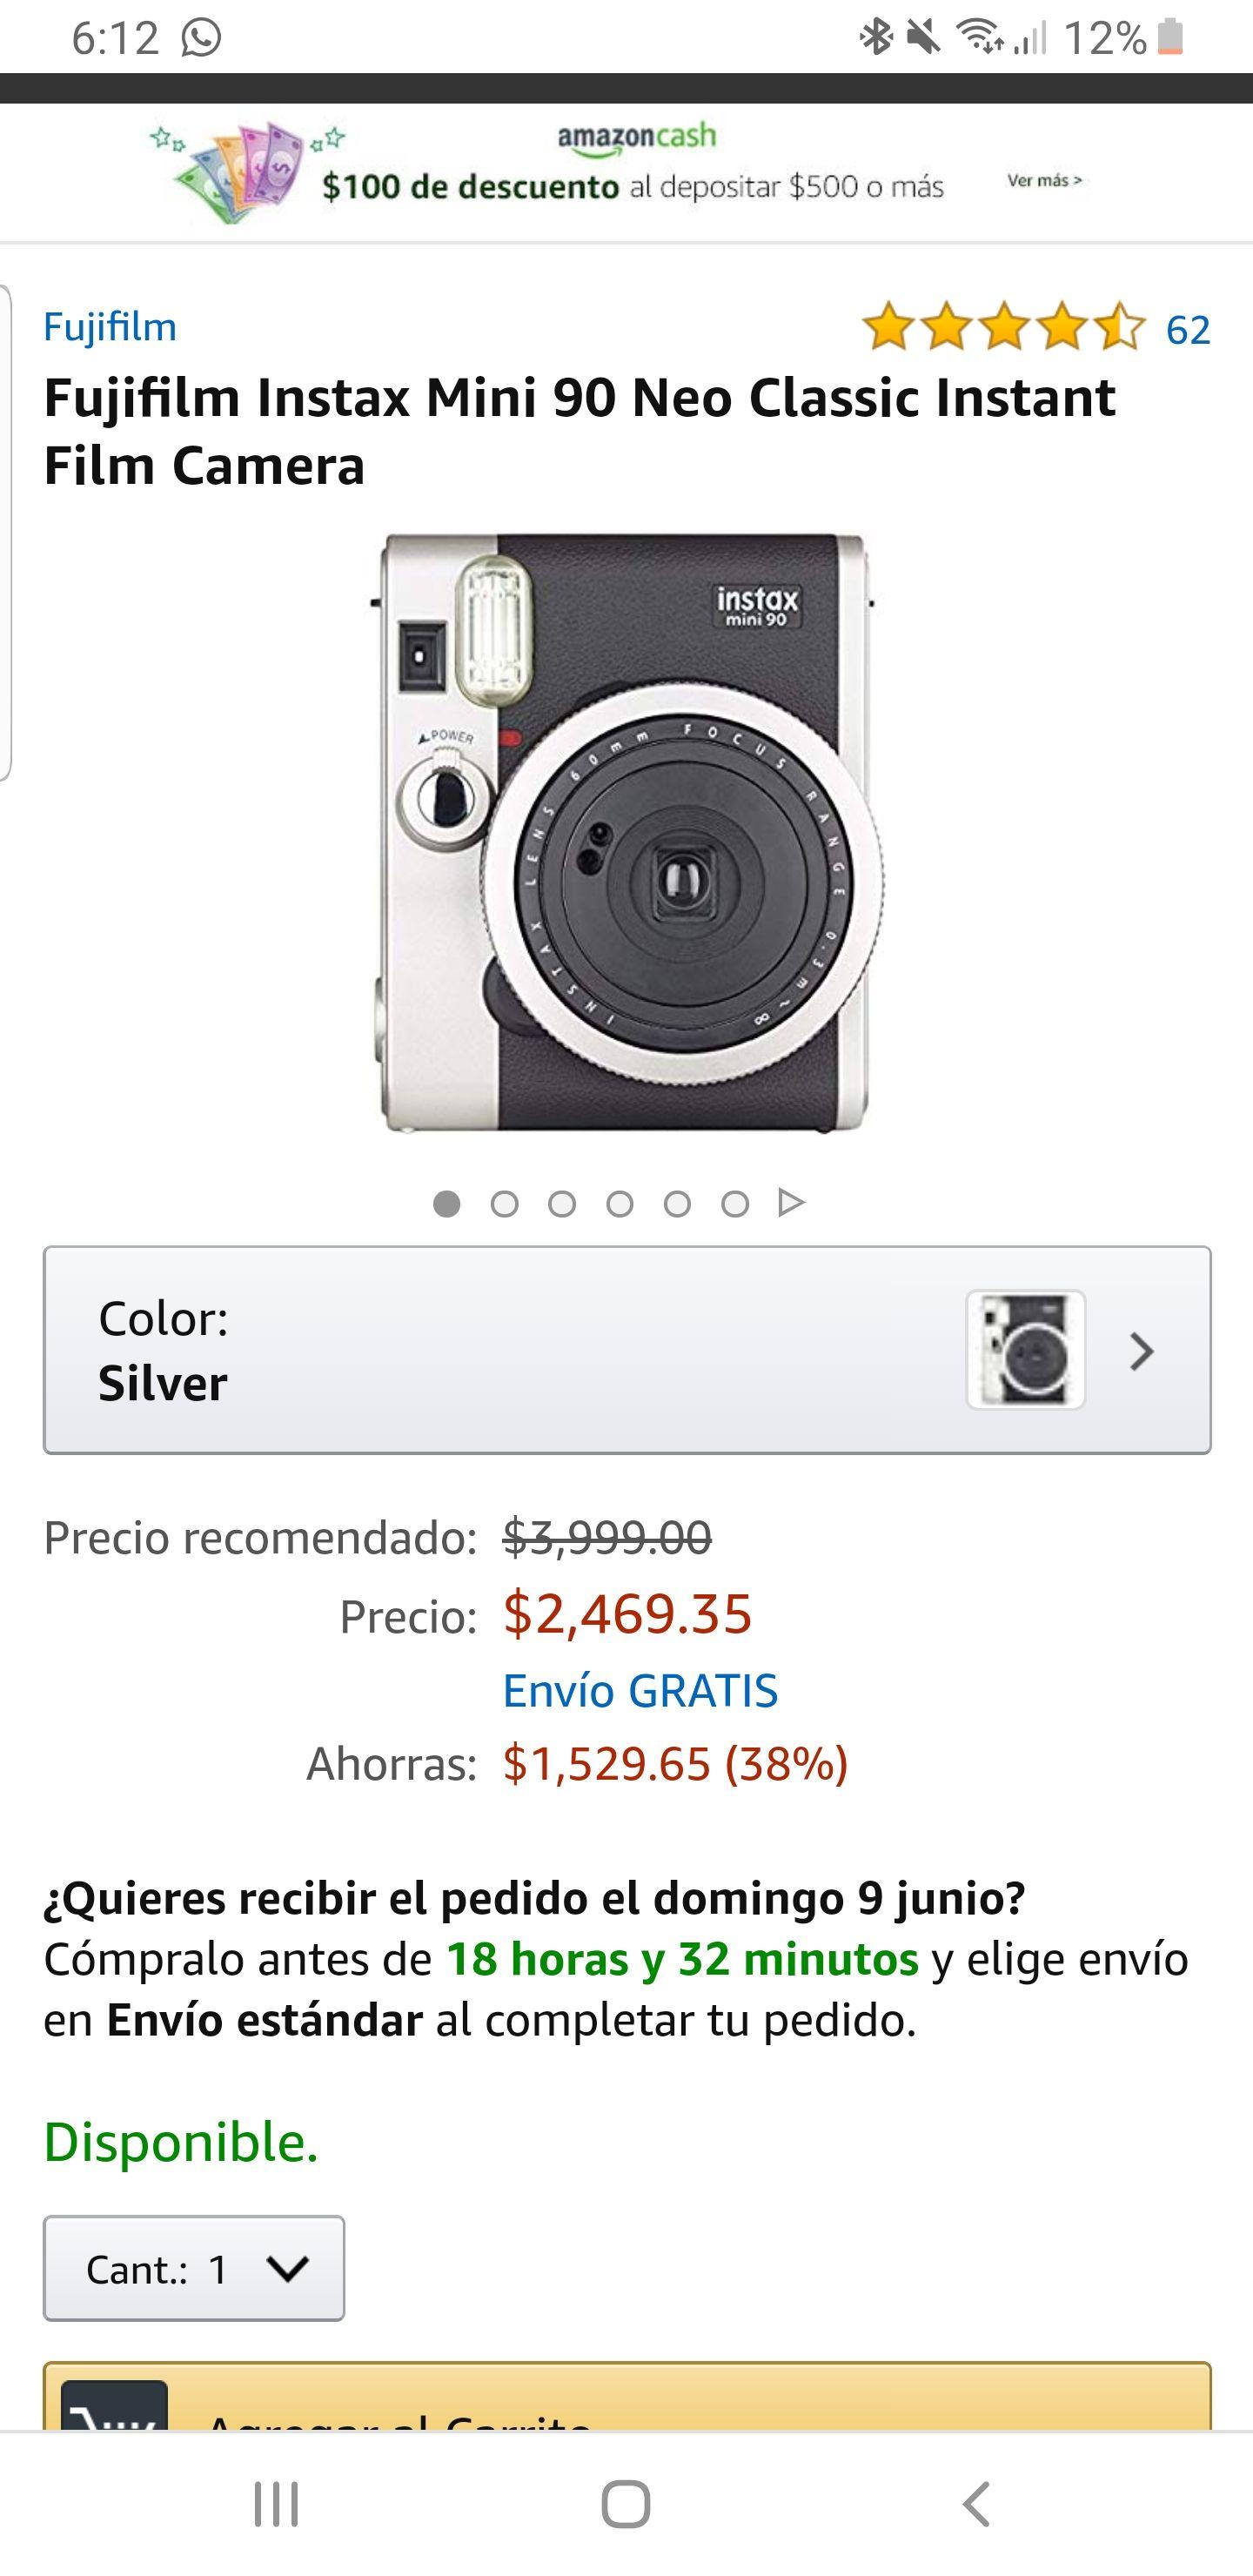 Amazon: Camara instantánea Fujifilm Instax mini 90